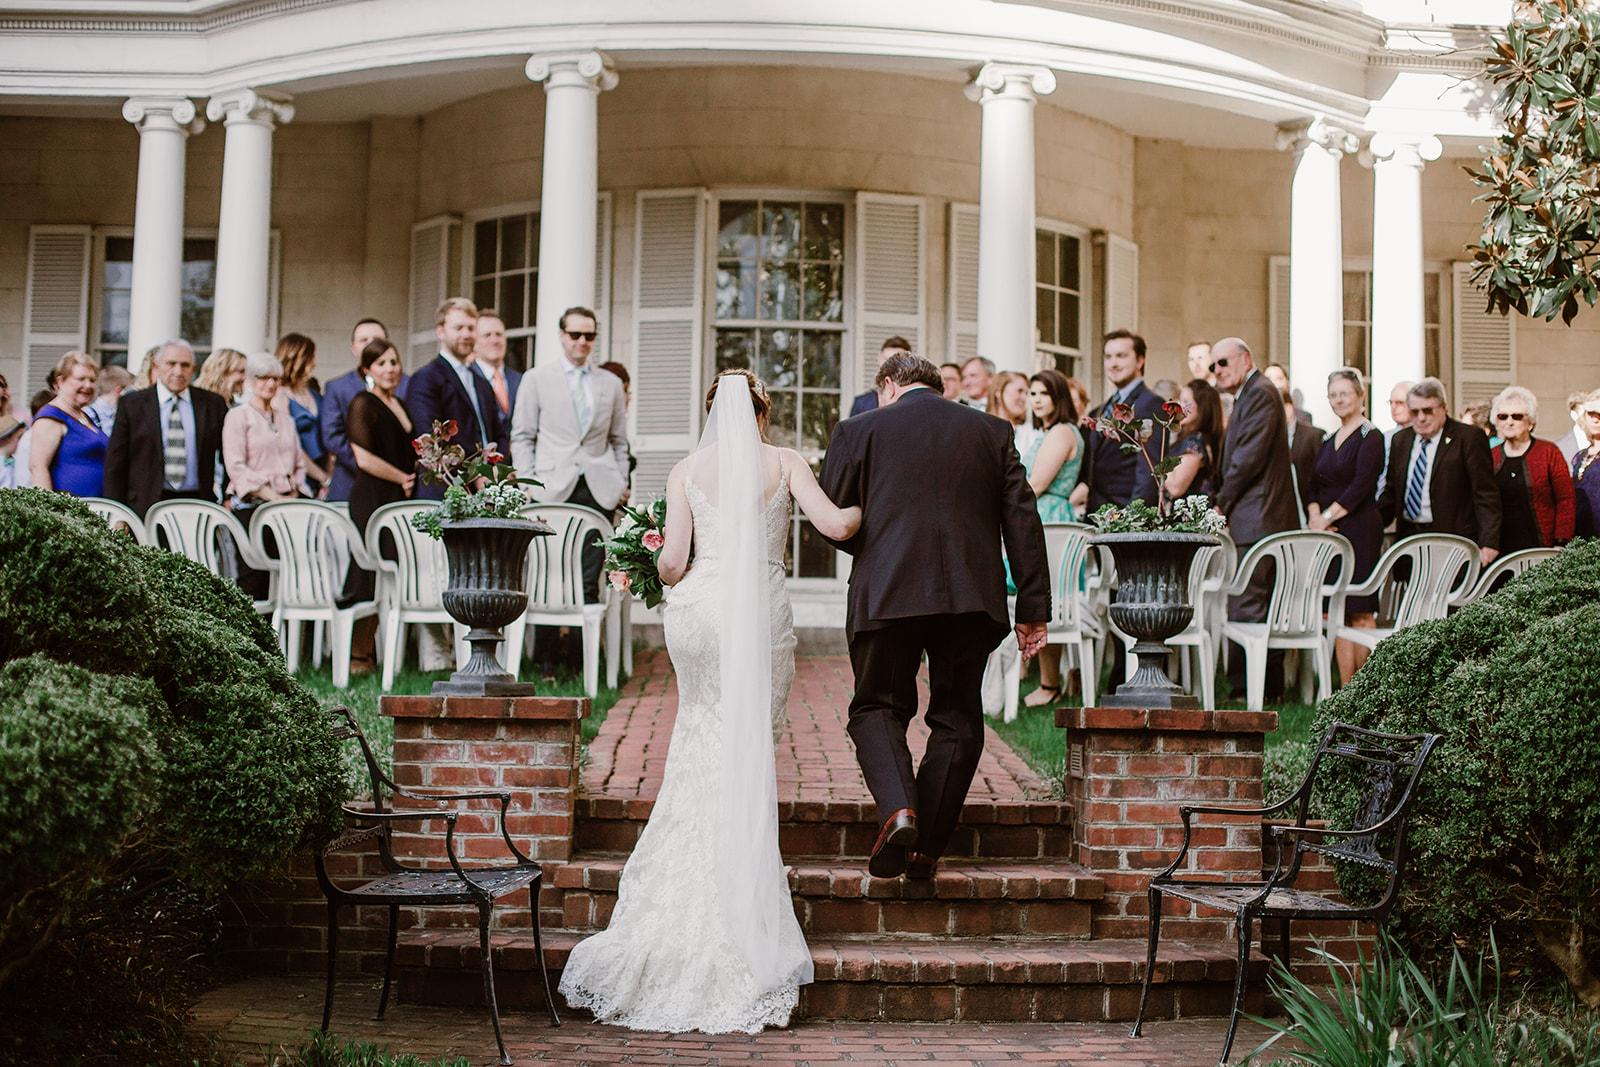 SarahMattozziPhotography-MaggieJustin-Ceremony-66.jpg